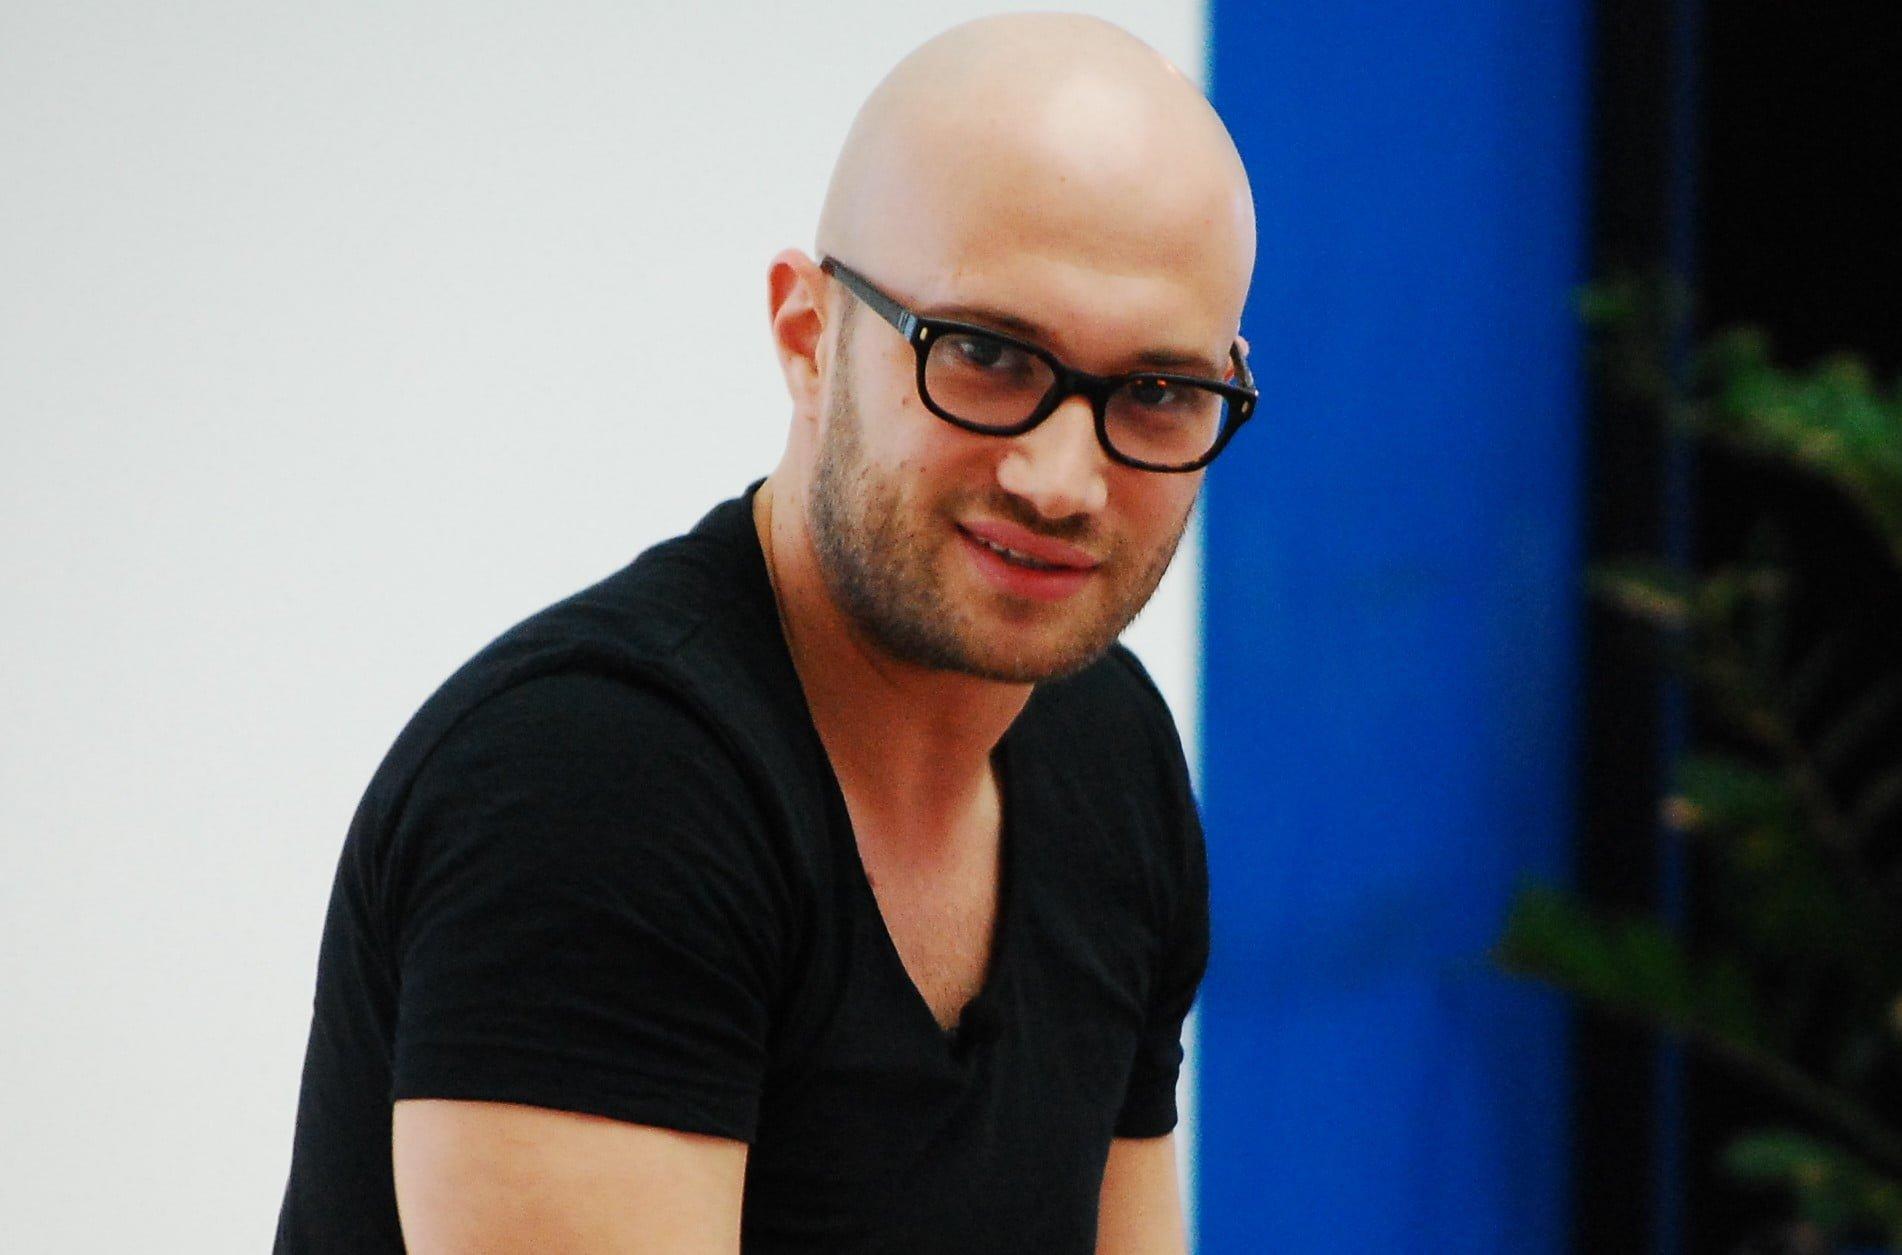 Mihai Bendeac, o noua colaborare in muzica! Vezi care este artistul cu care va inregistra o noua melodie!